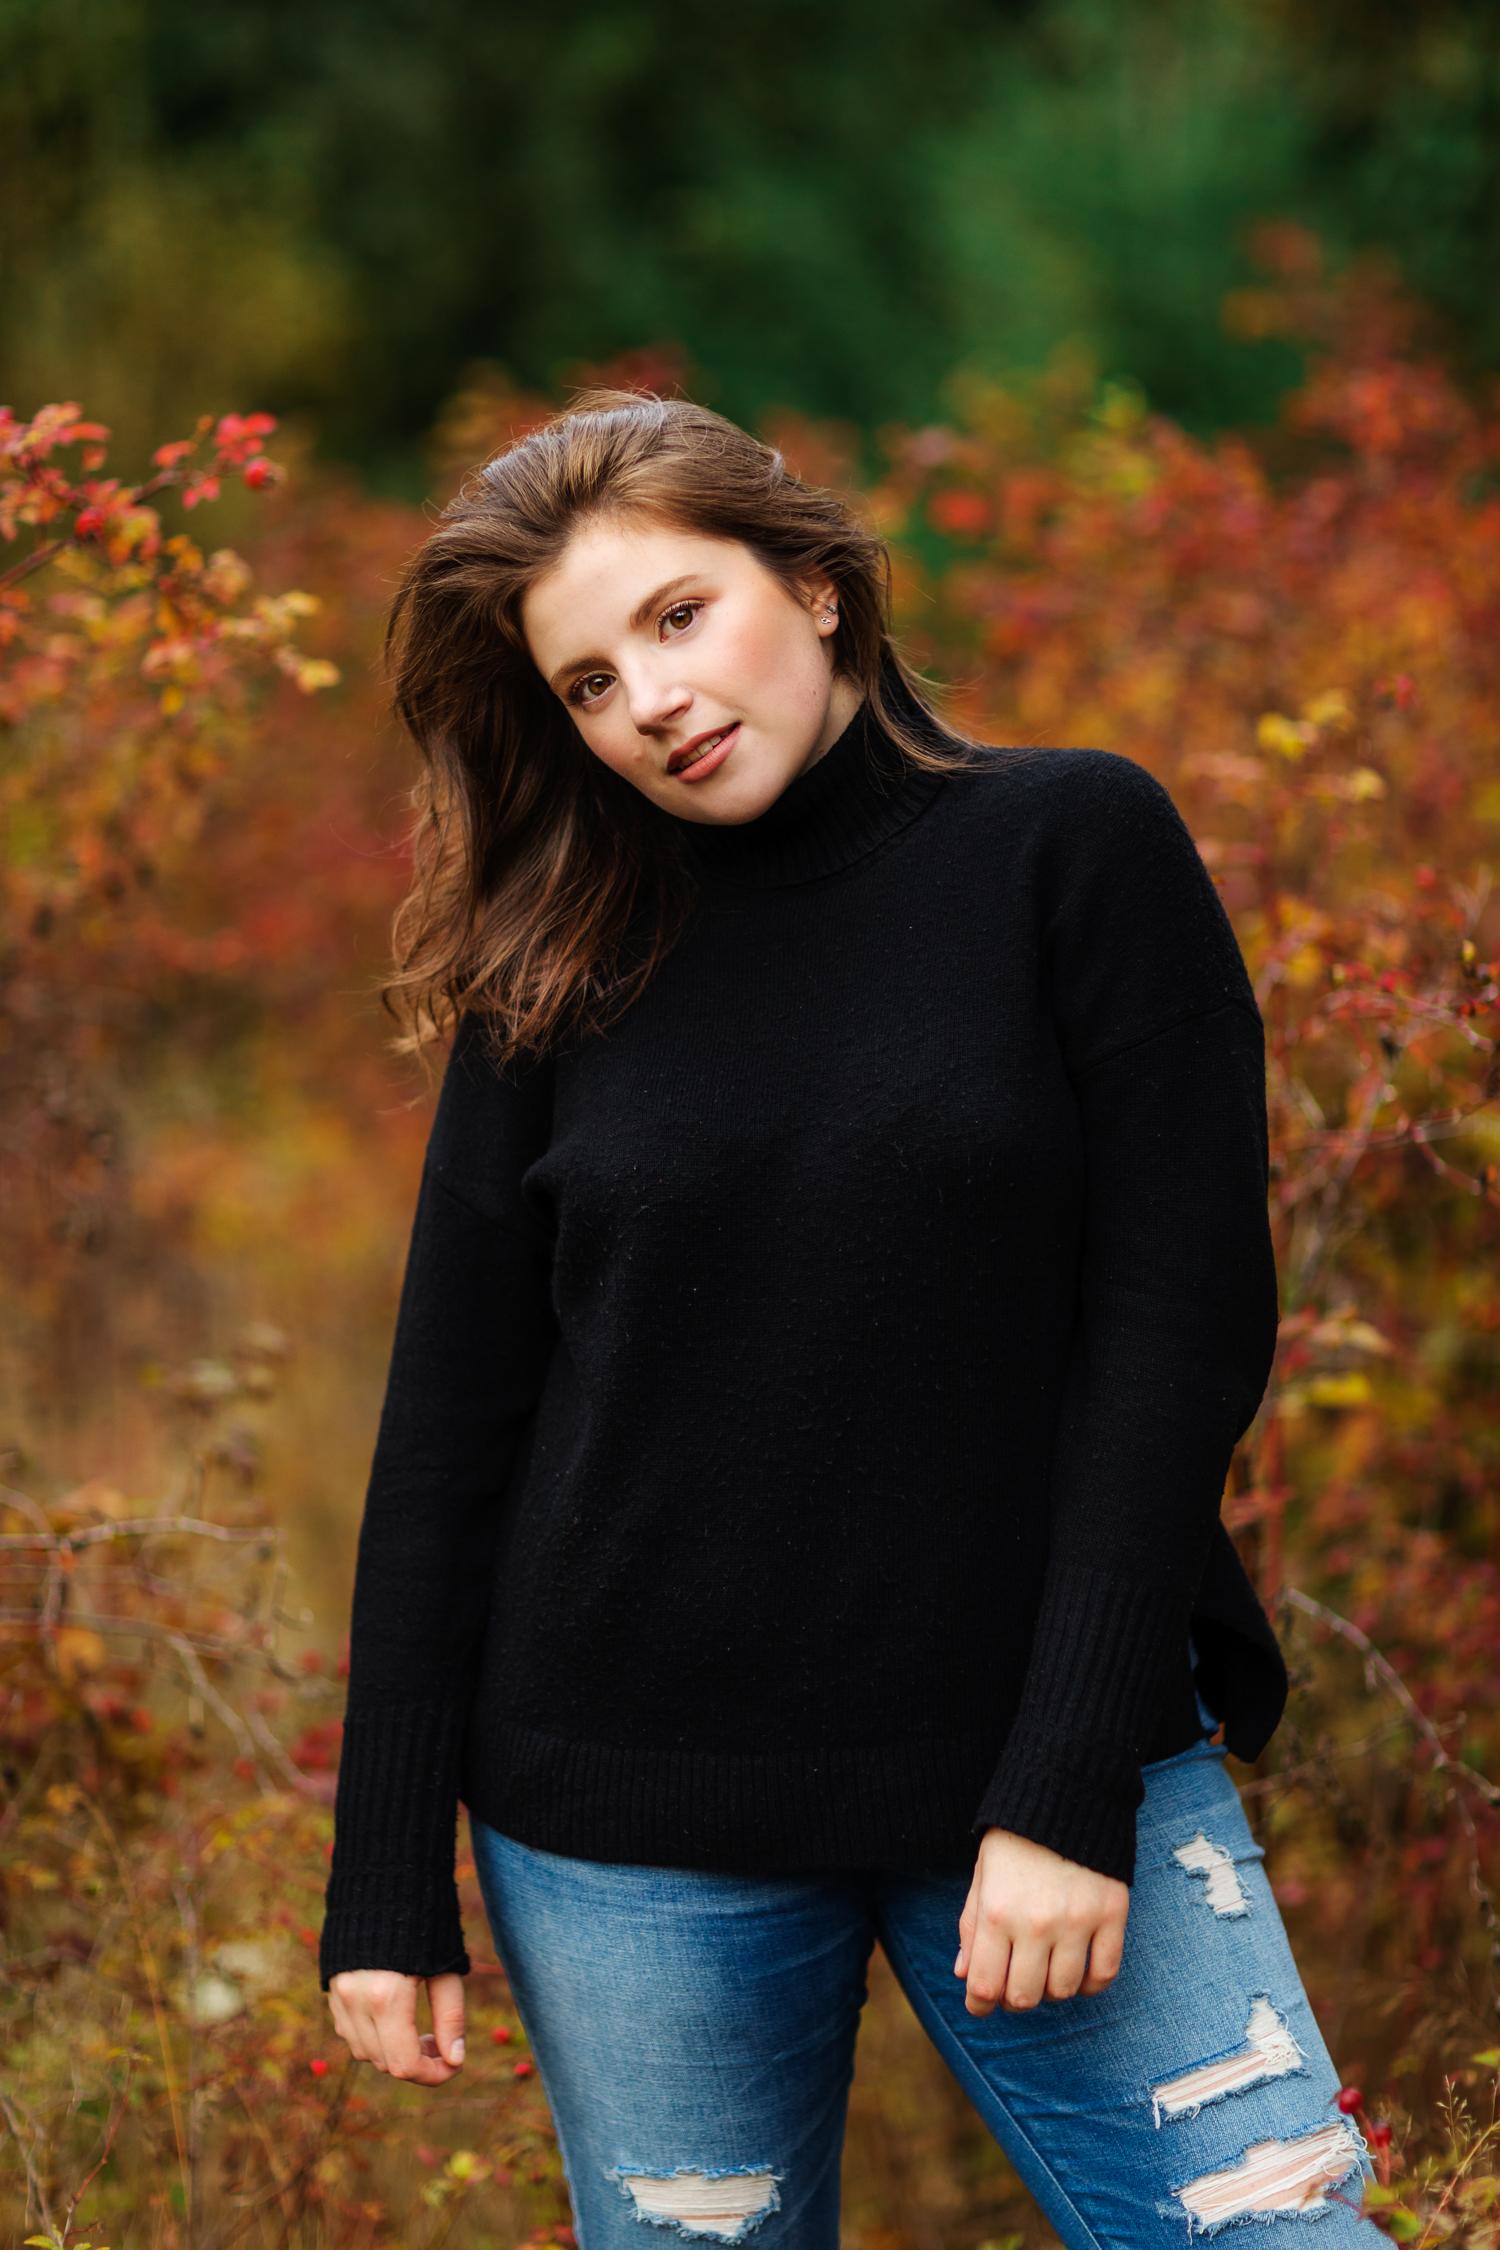 ariellanoellephotography-overlake-high-school-senior-portraits-top-seattle-area-highschool-senior-photographer-1-7.jpg